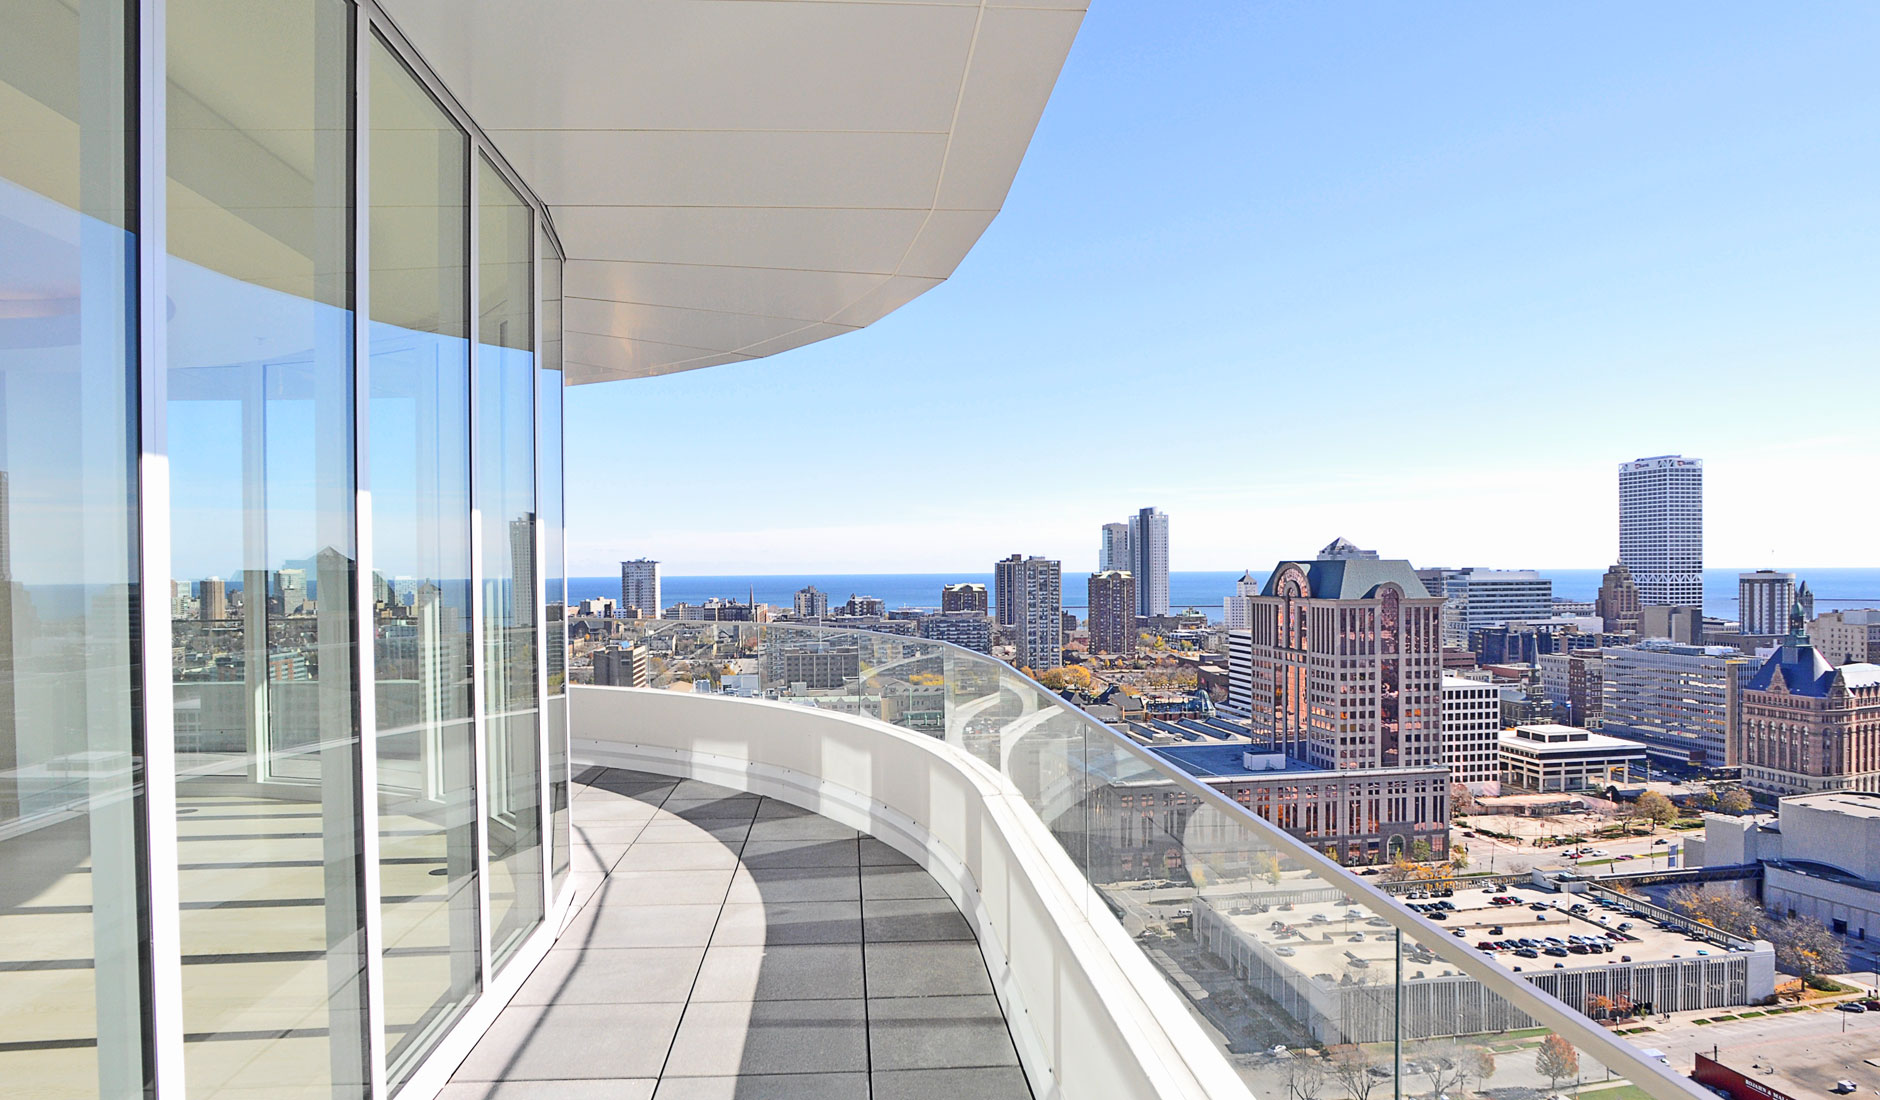 1 Bedroom Apartment Rent 18 Reasons To Move To Milwaukee Onmilwaukee